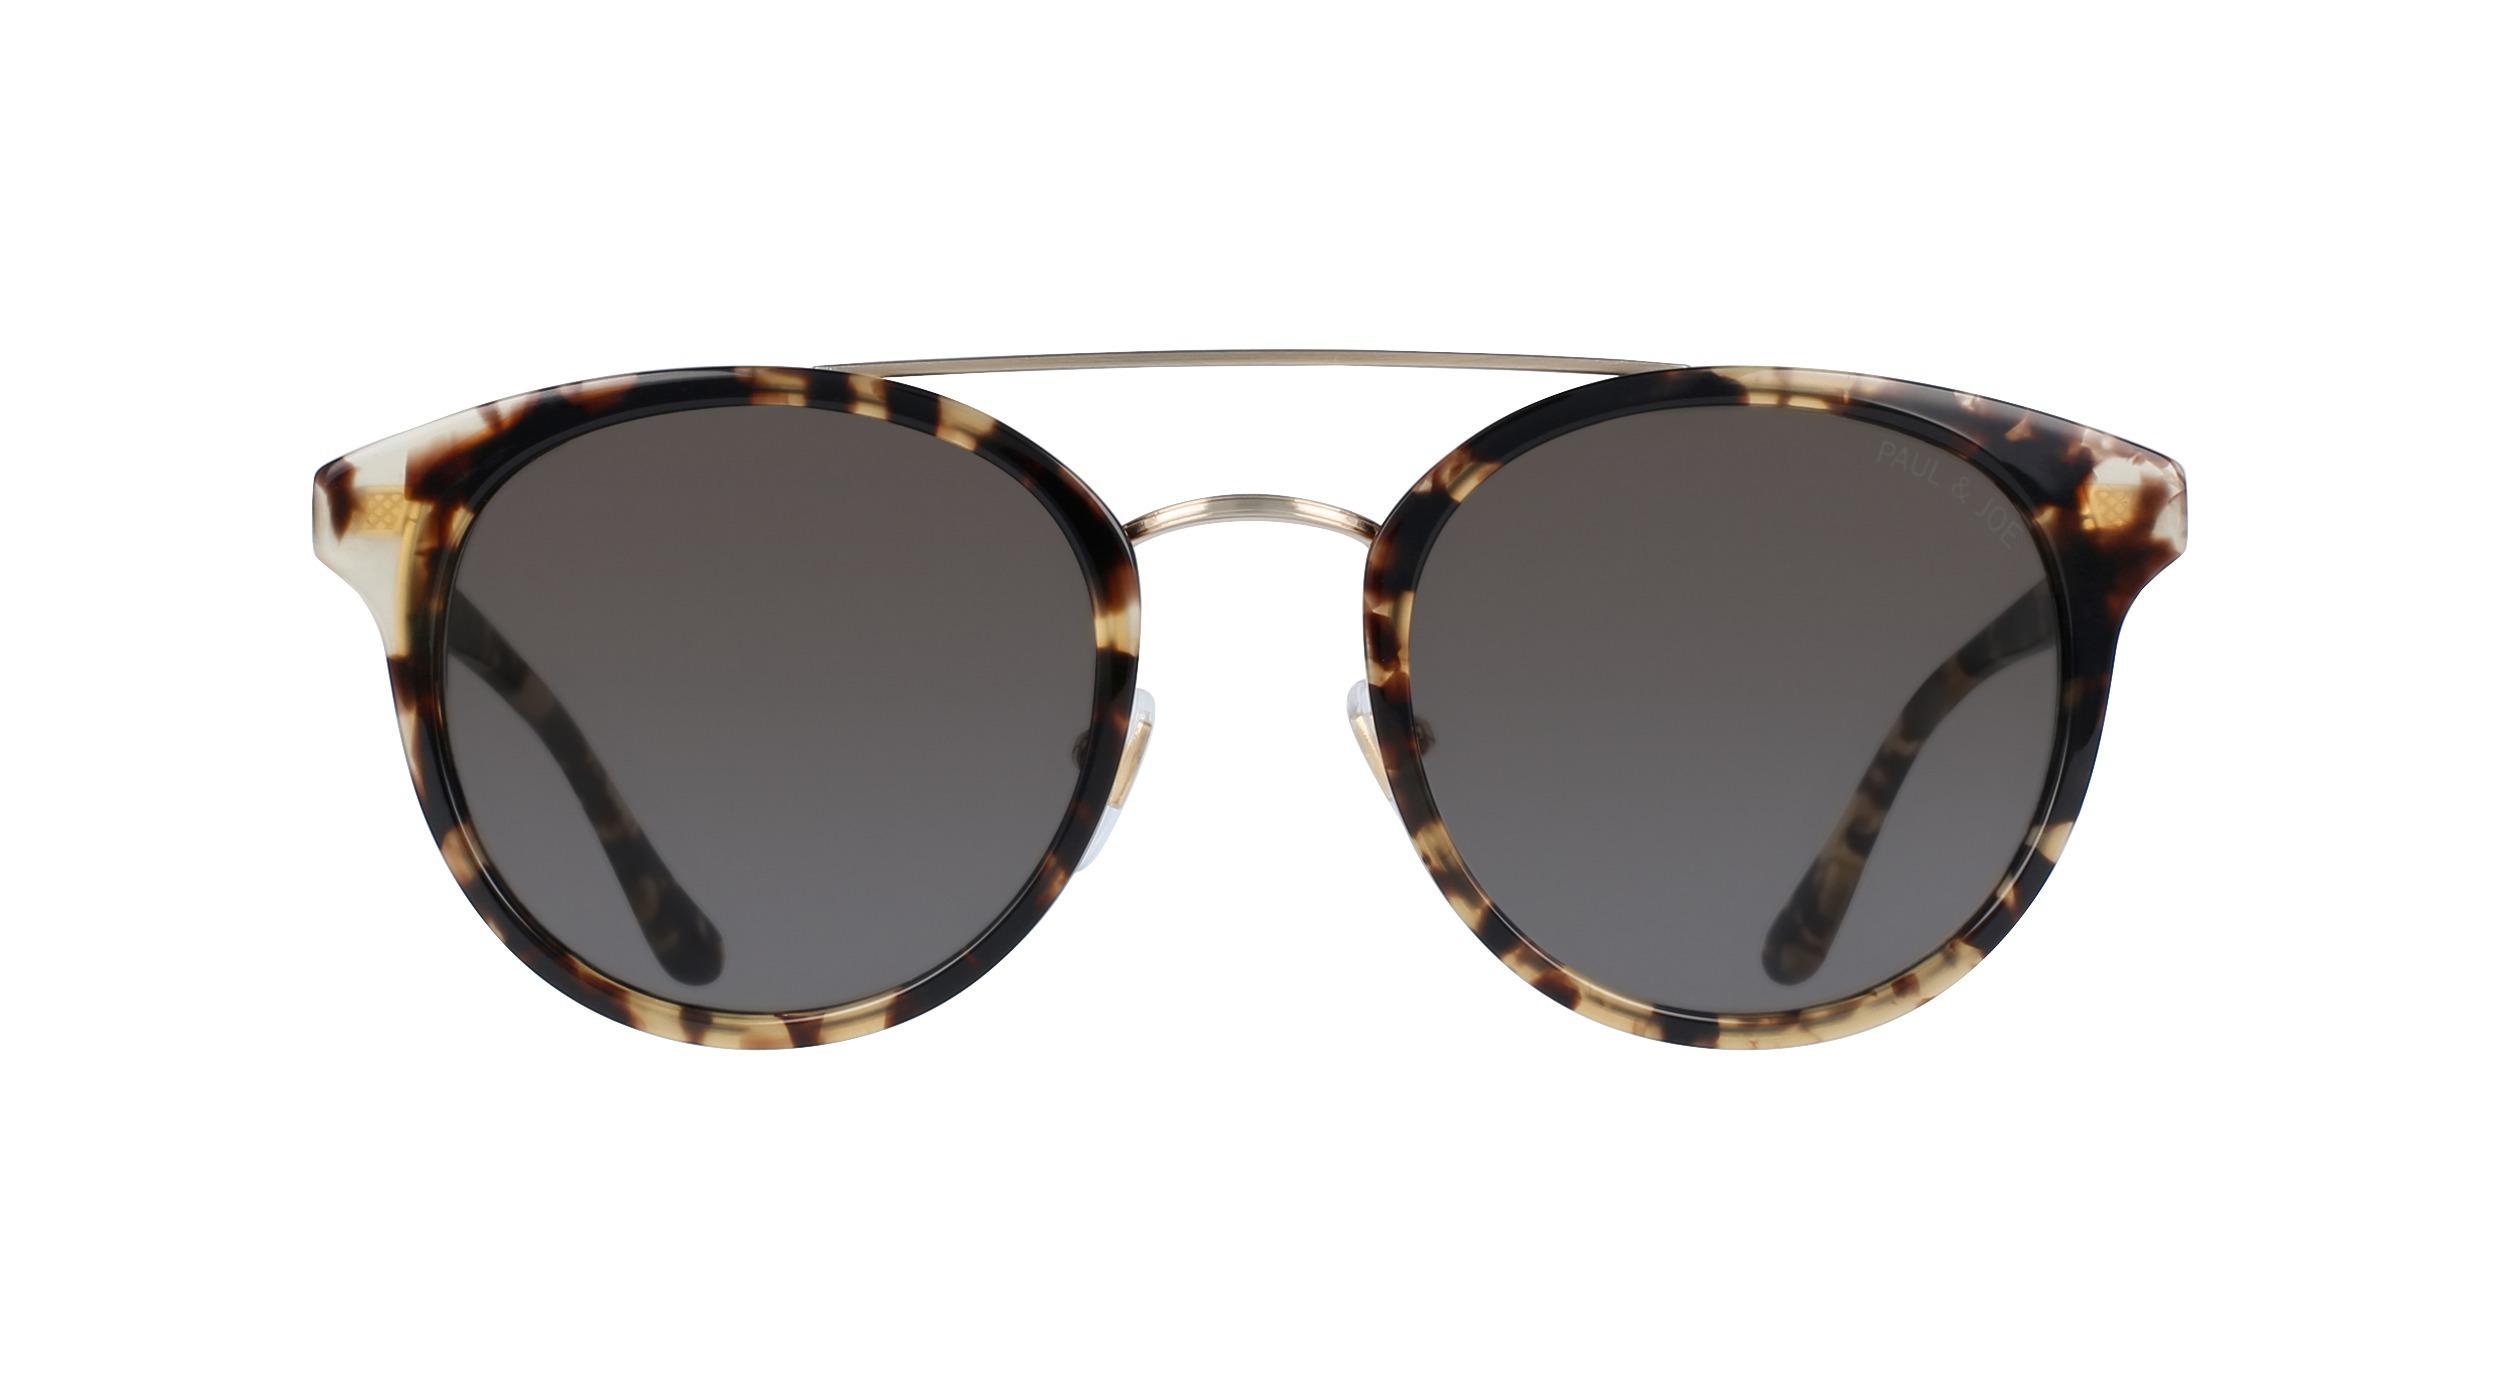 optic2000-lunettes-soleil-paul-joe